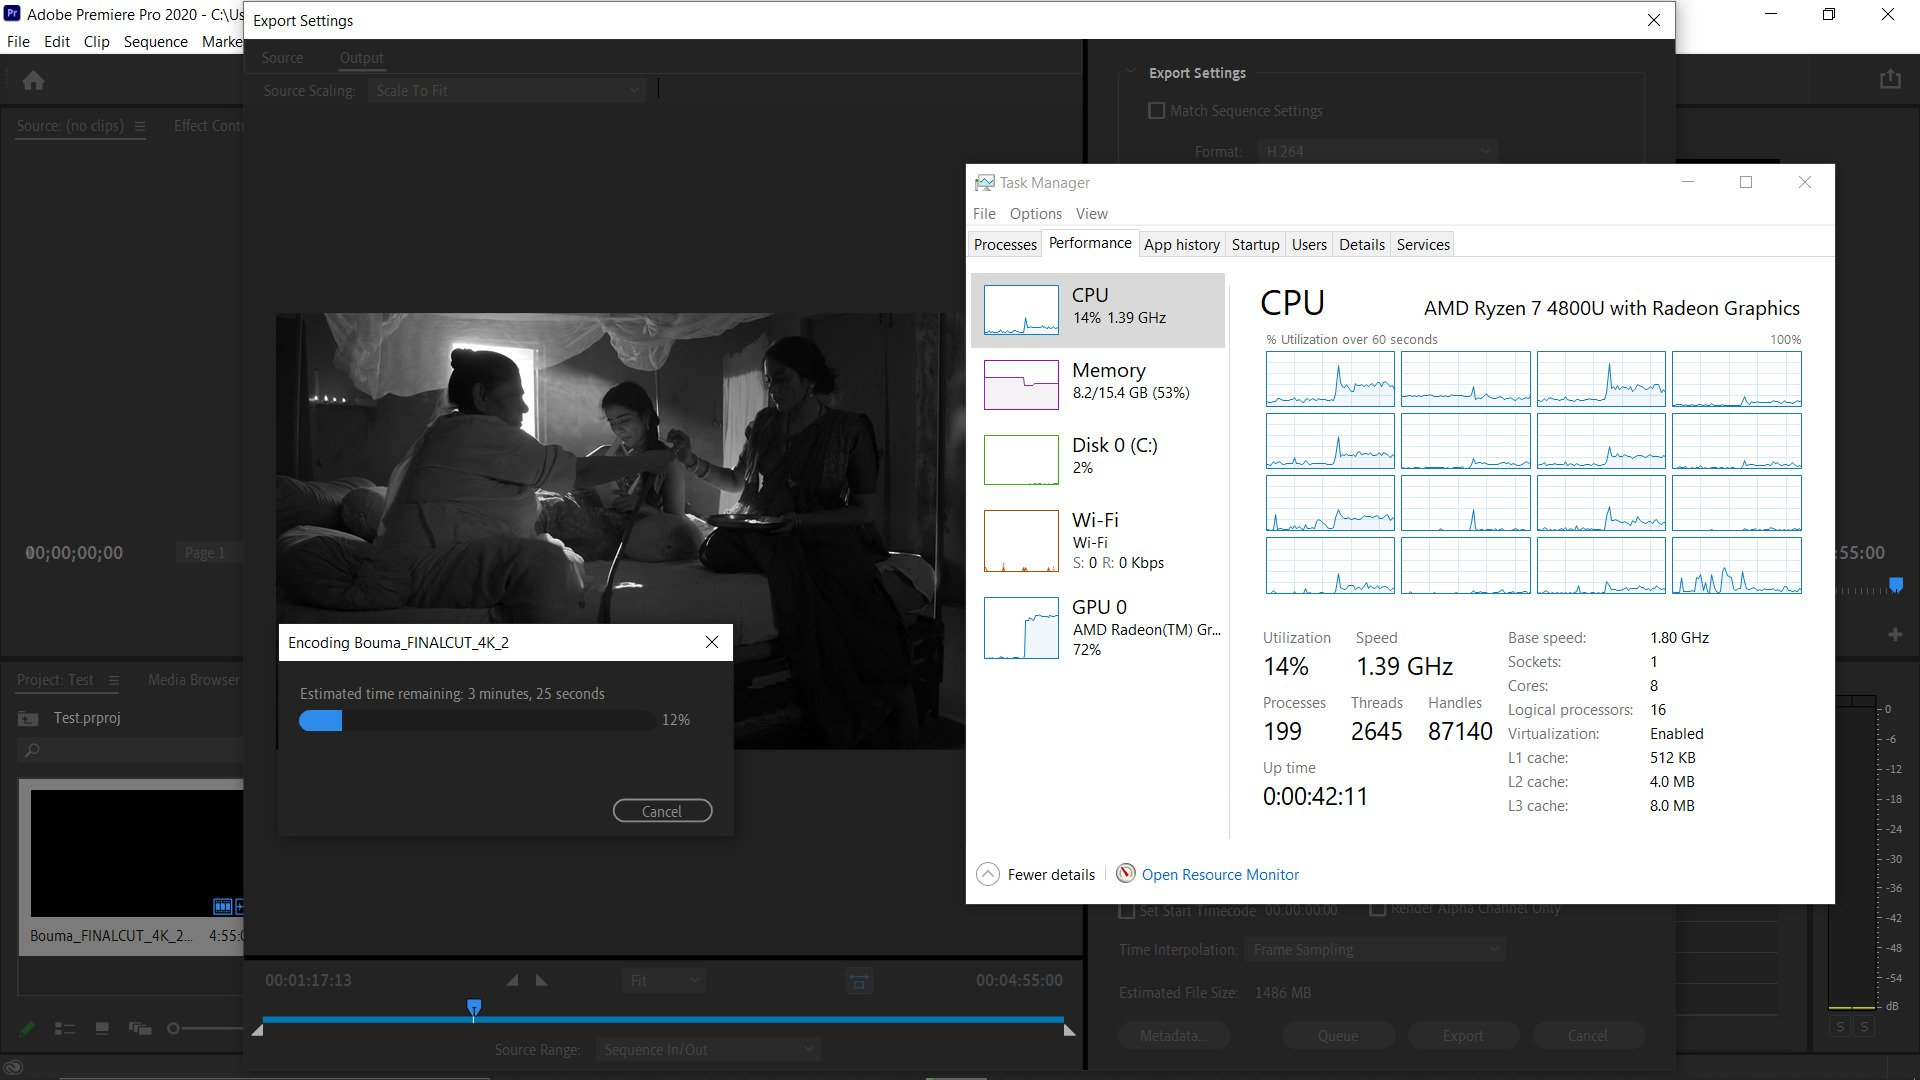 Lenovo Ideapad Slim 7 - AMD Ryzen 7 4800U GPU Encode